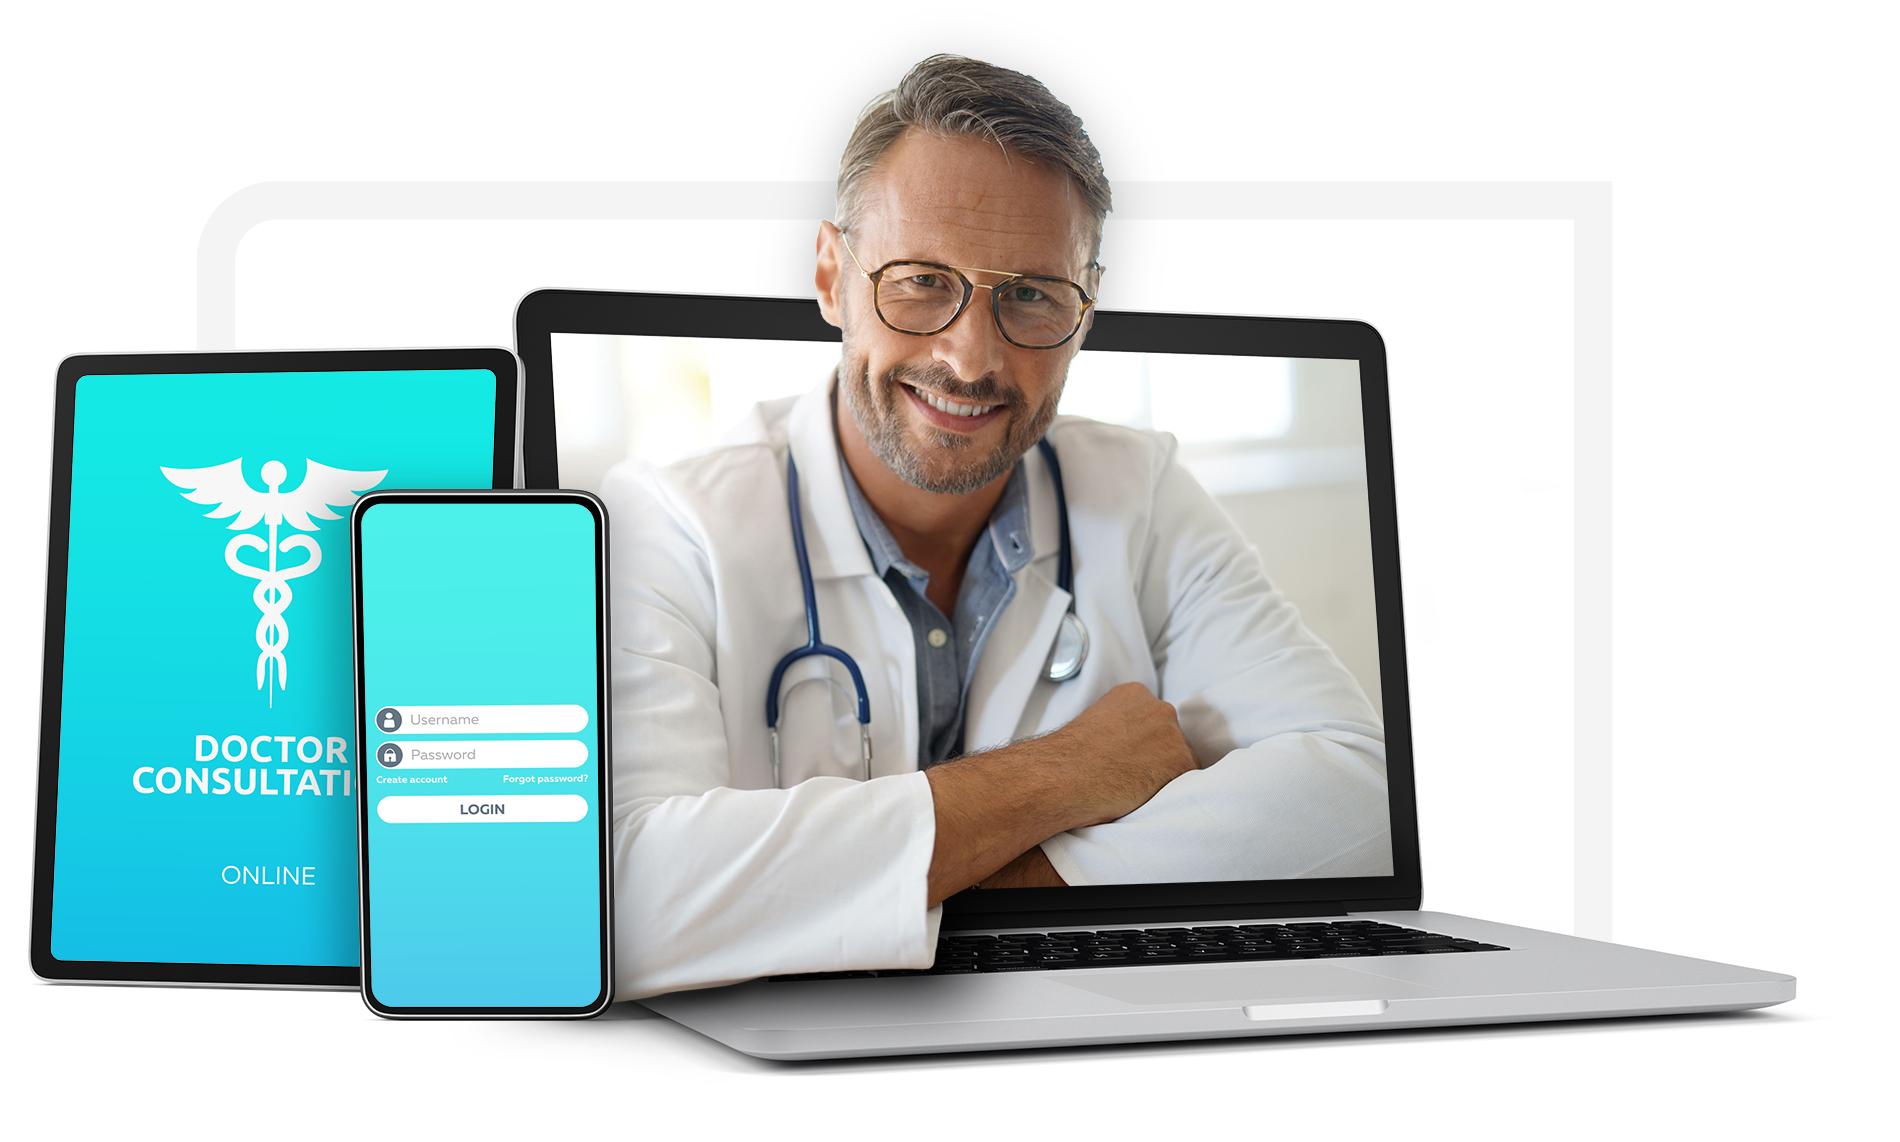 OneShare Health | Christian Health Share Telemedicine